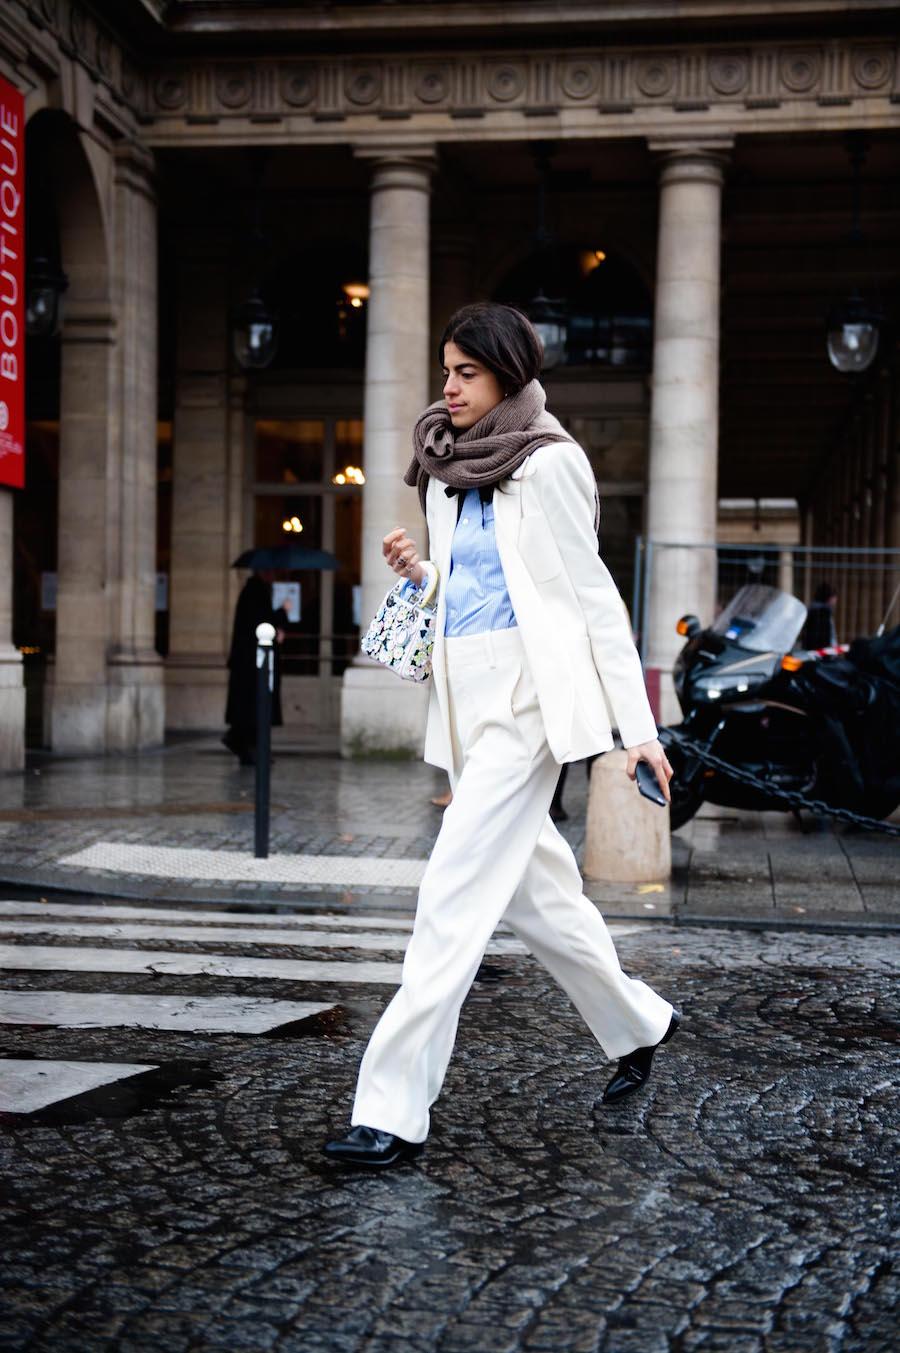 Paris Fashion Week Street Style 2016-22